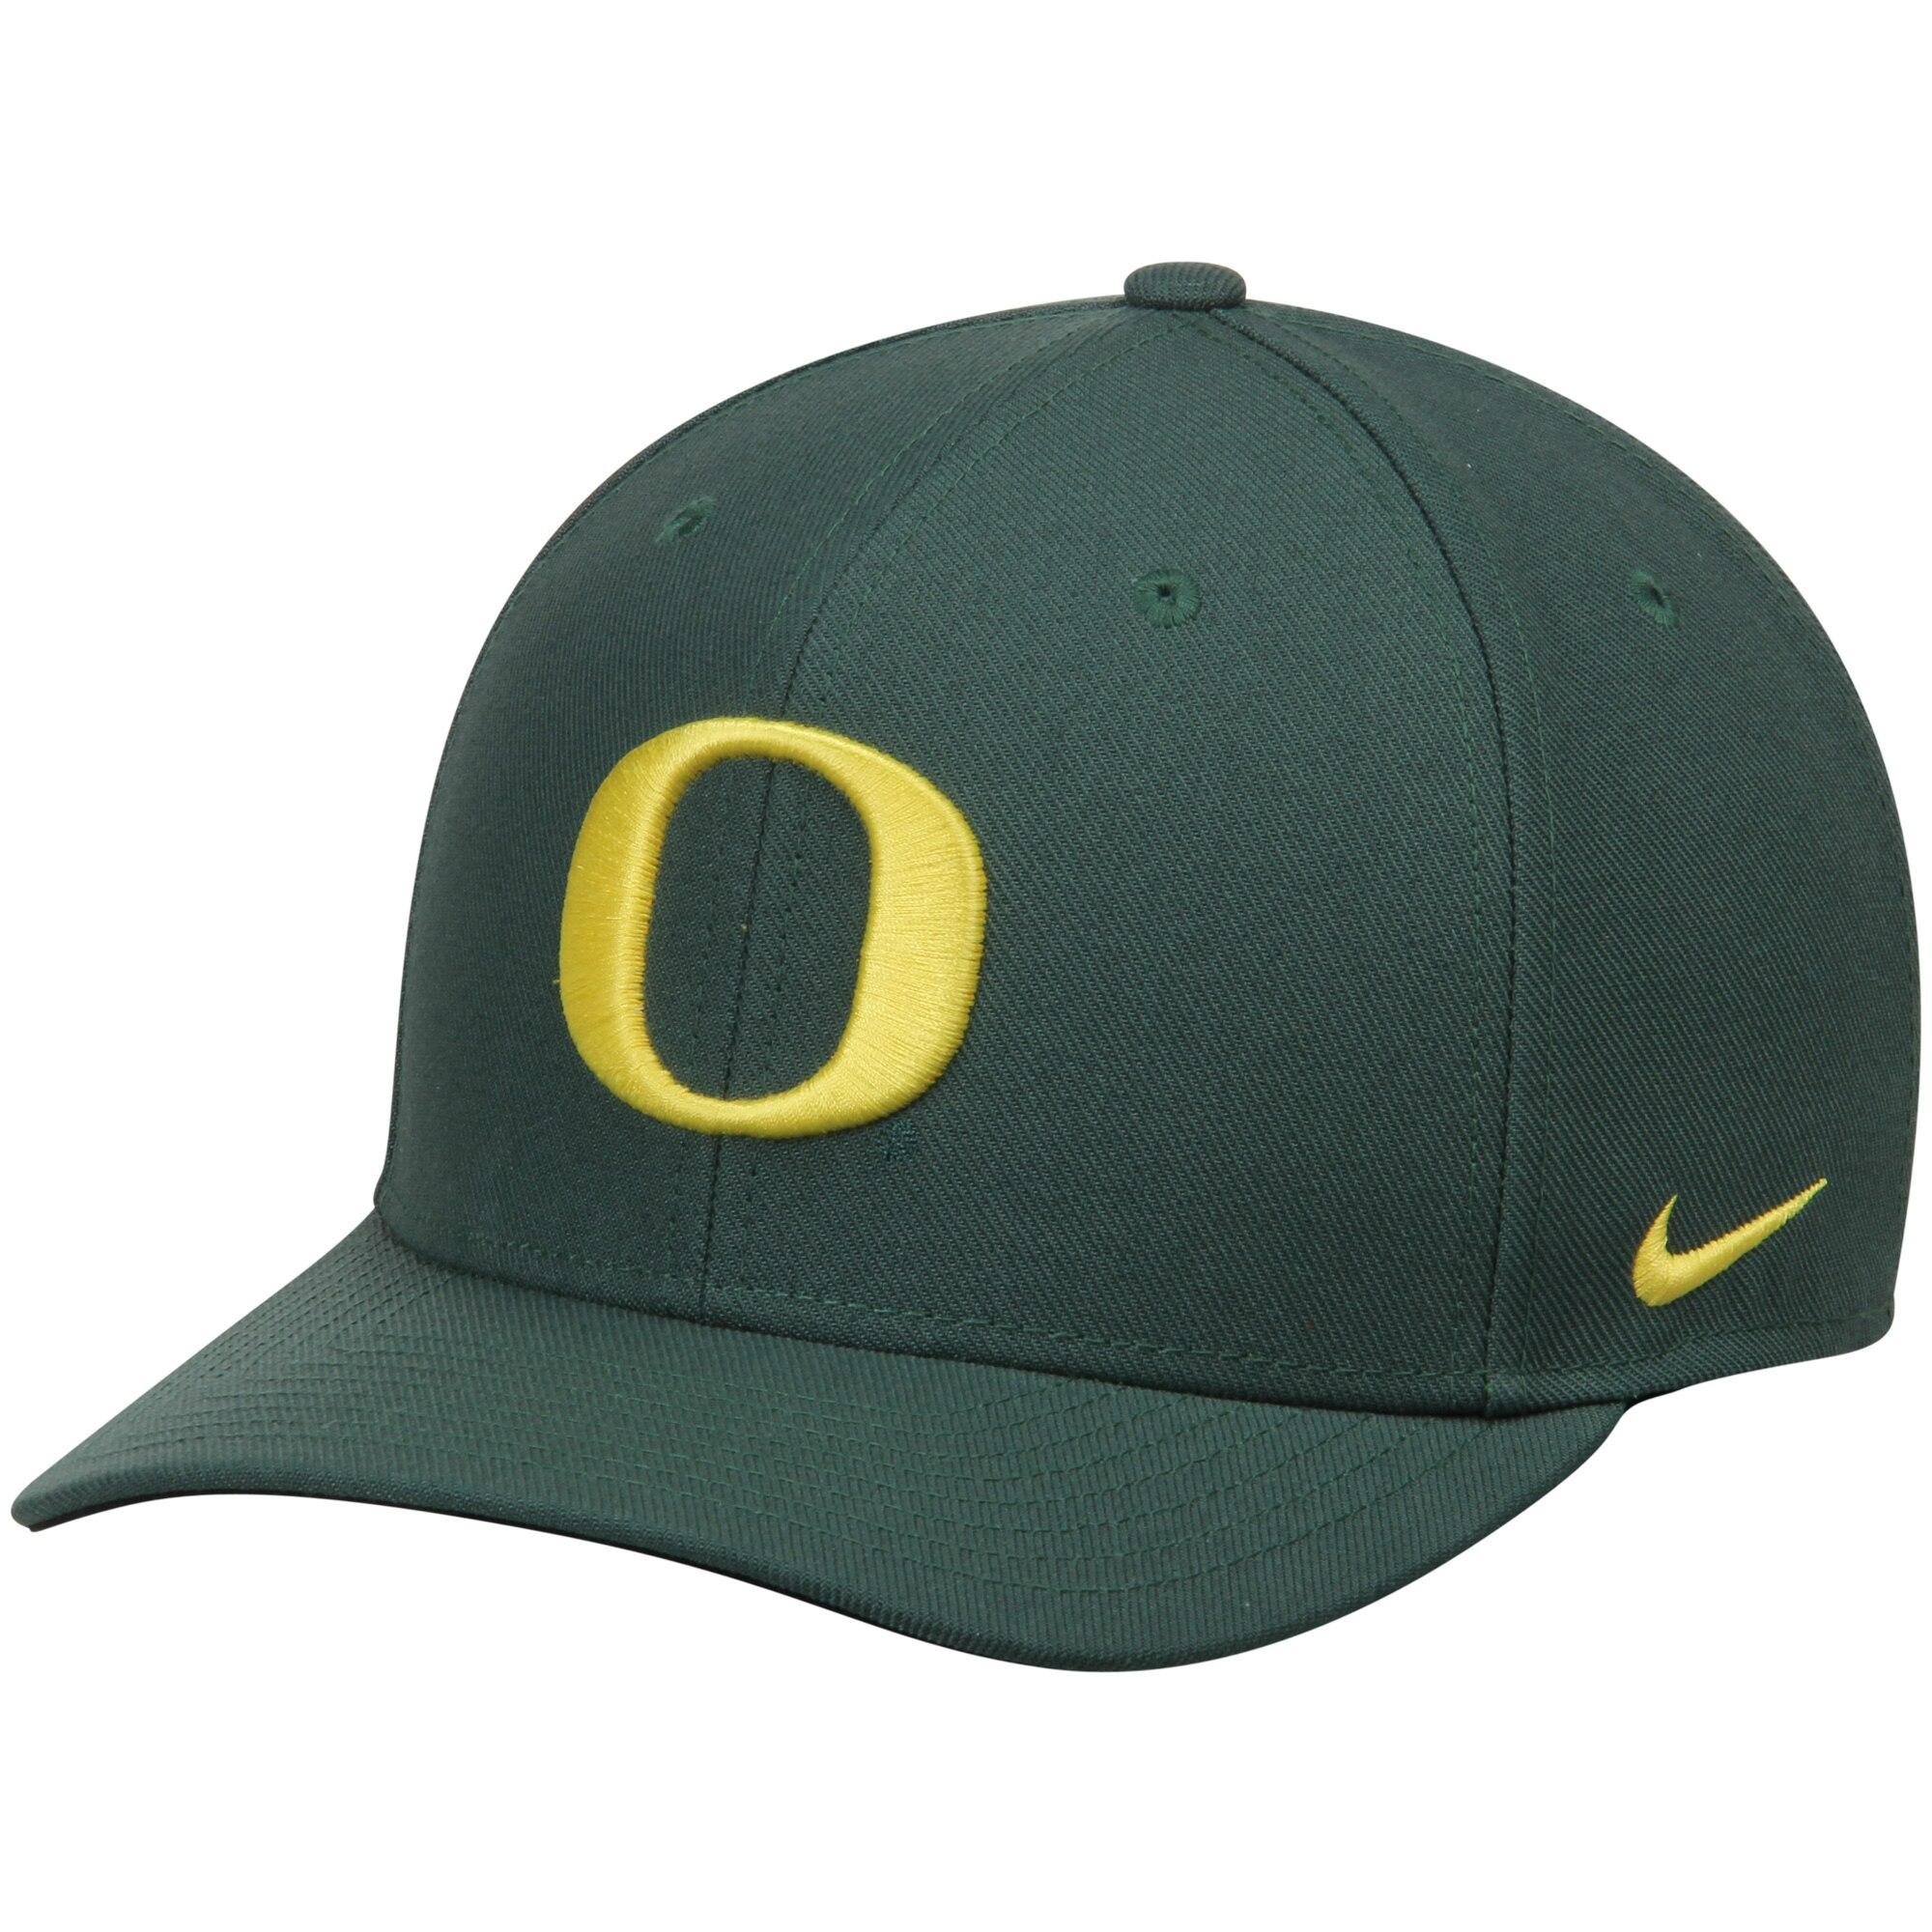 Oregon Ducks Nike Wool Classic Performance Adjustable Hat - Green